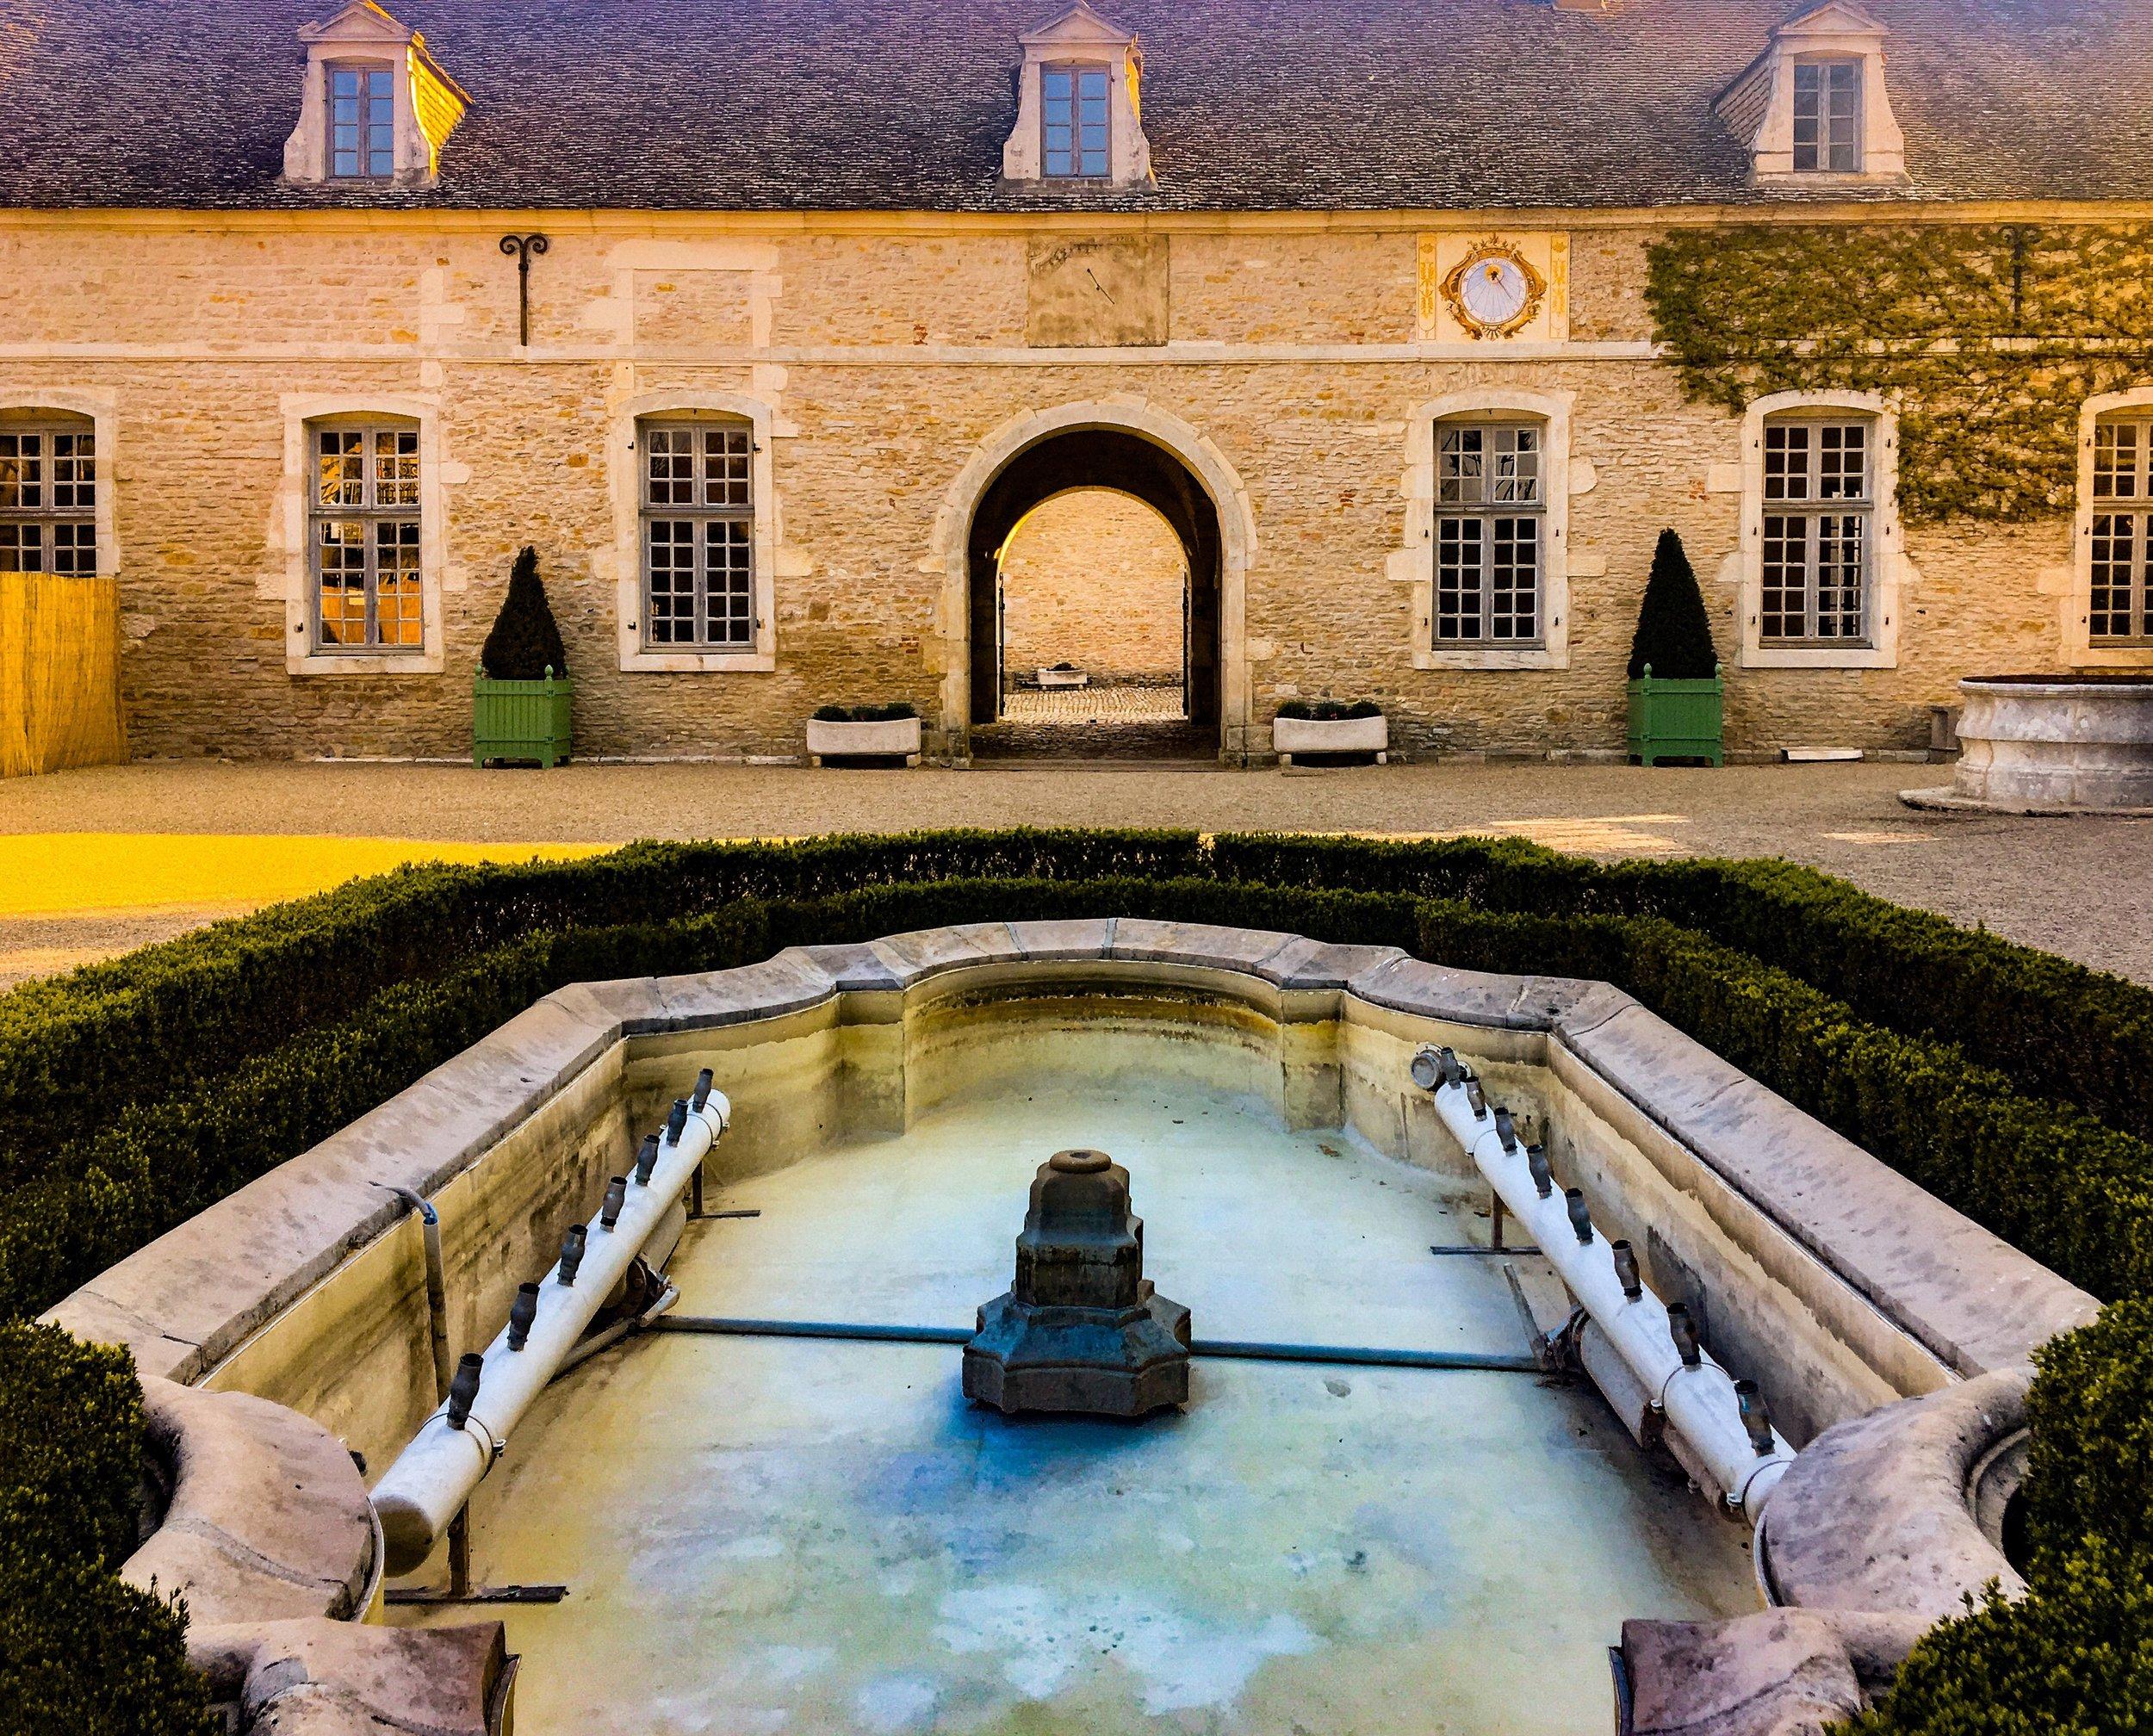 Château de Pommard in the Burgundy region of France